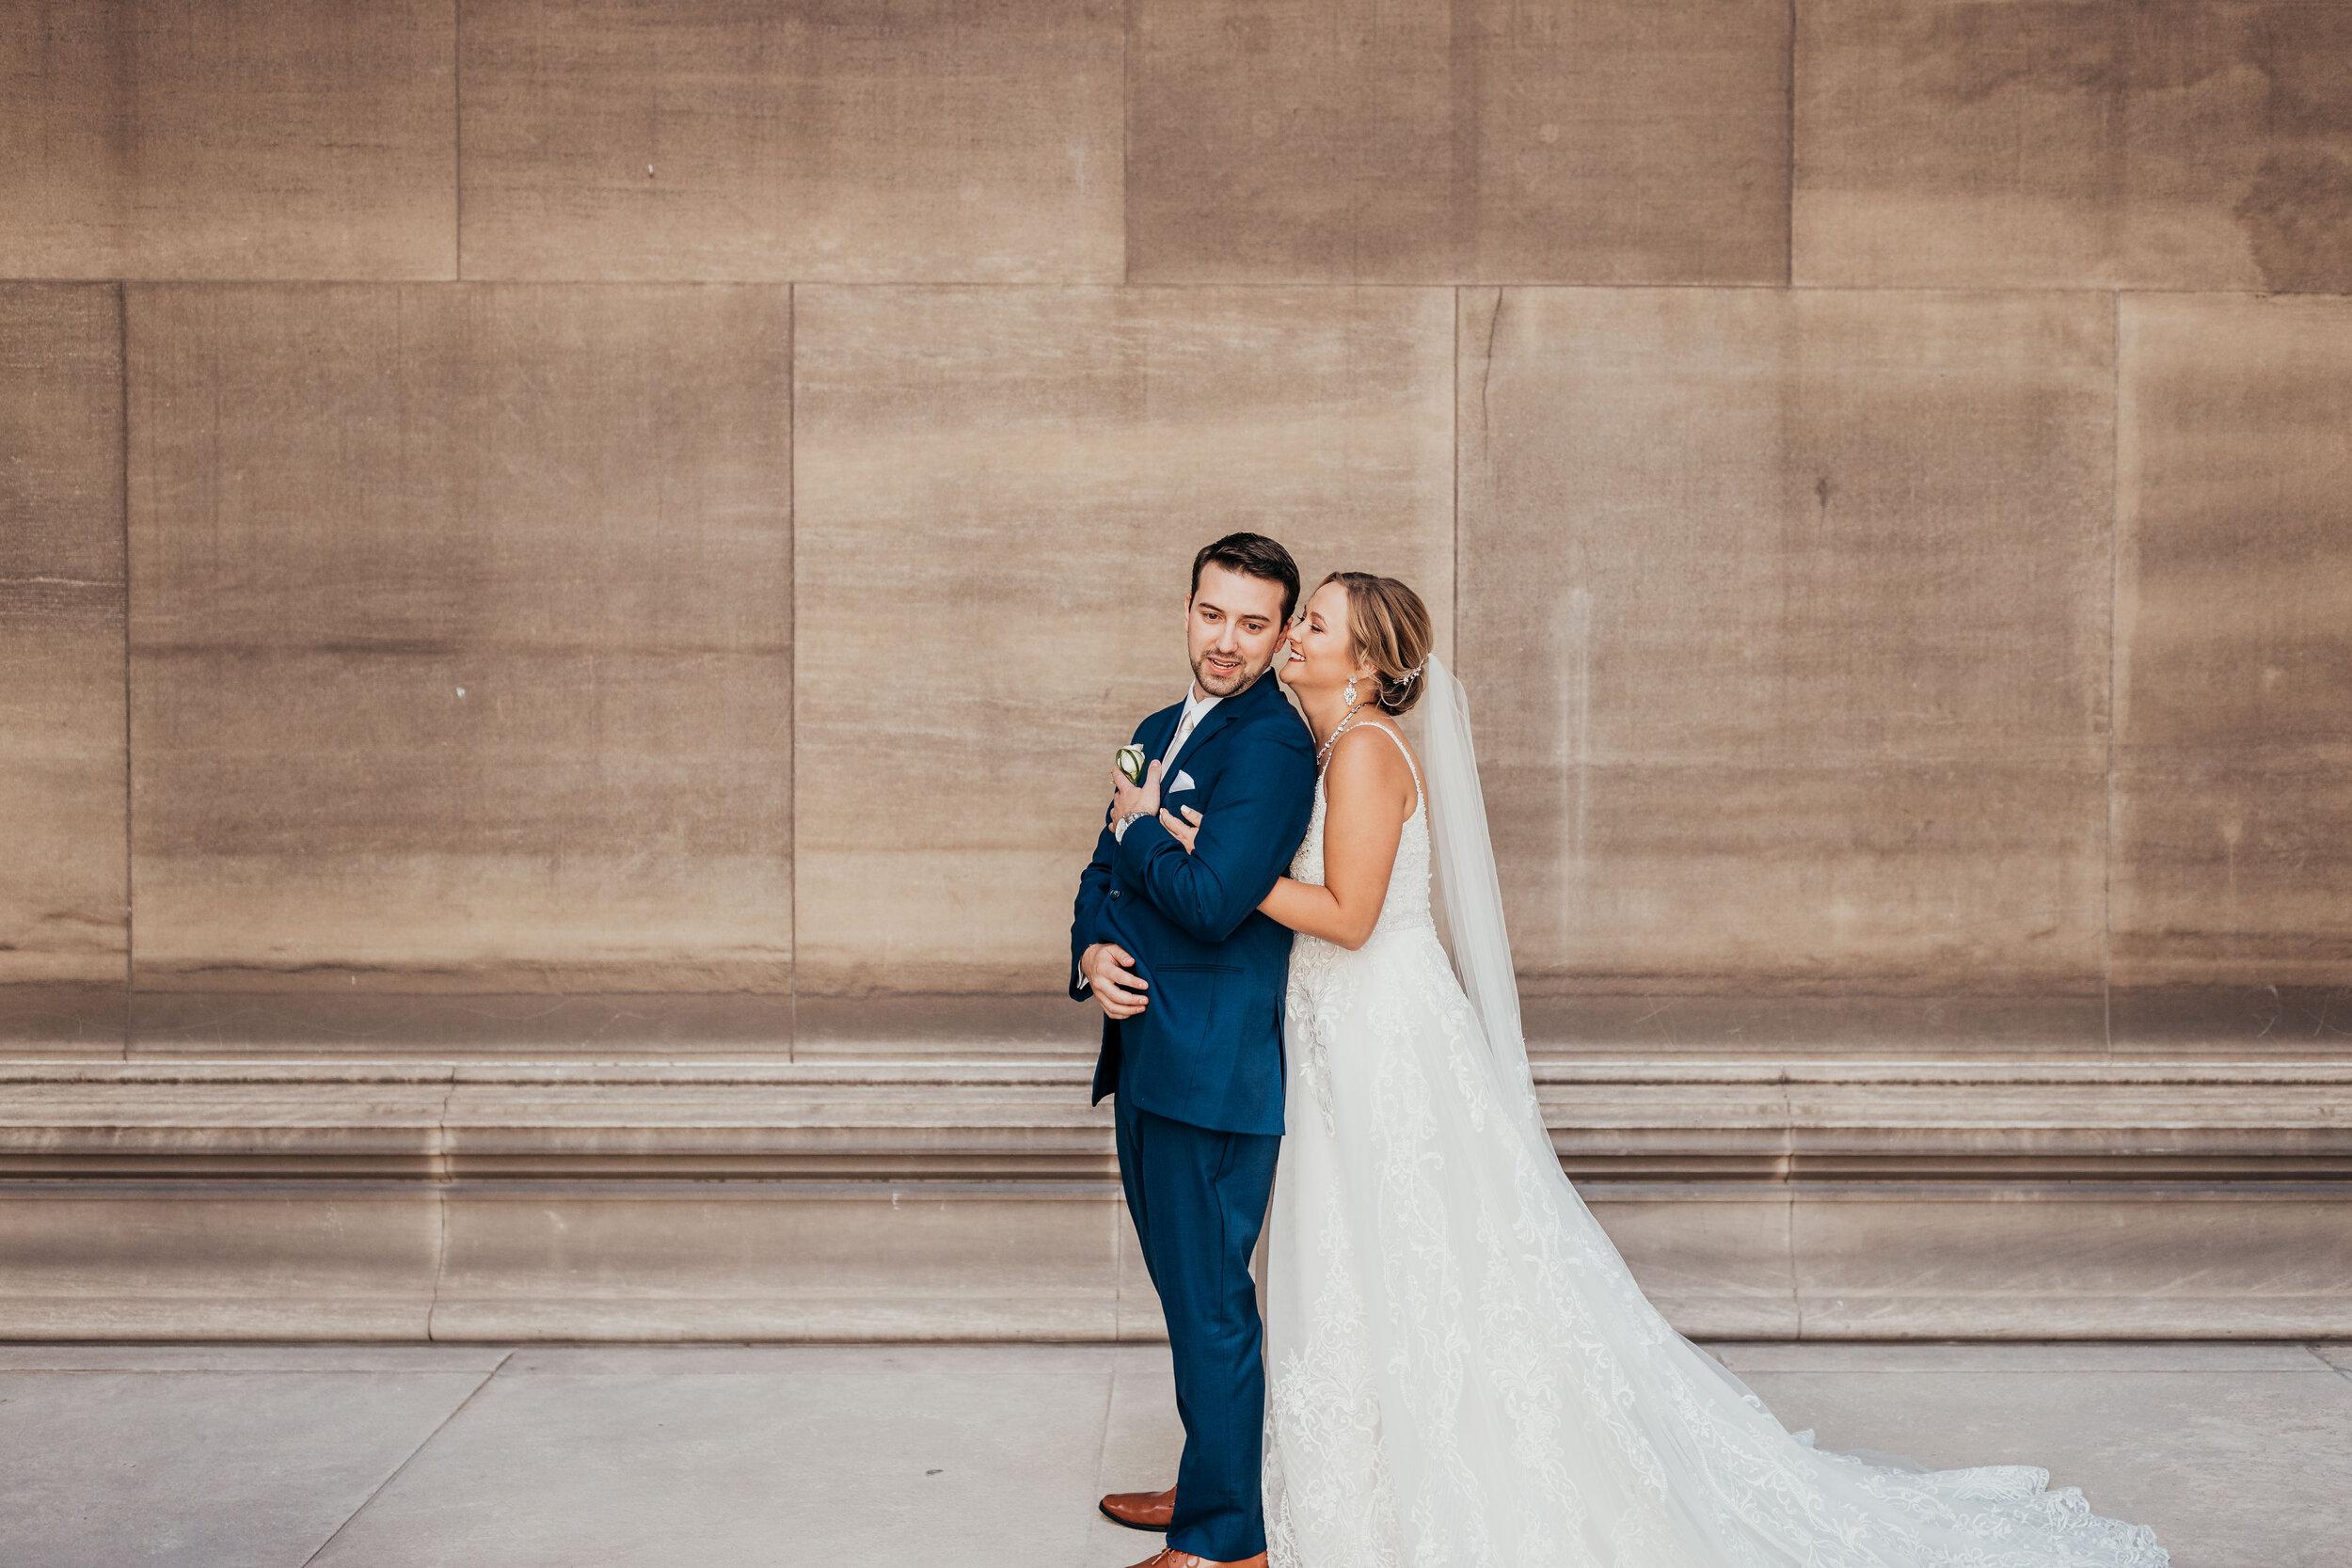 Pittsburgh wedding photography - Hartwood Acres Mansion wedding-248.jpg